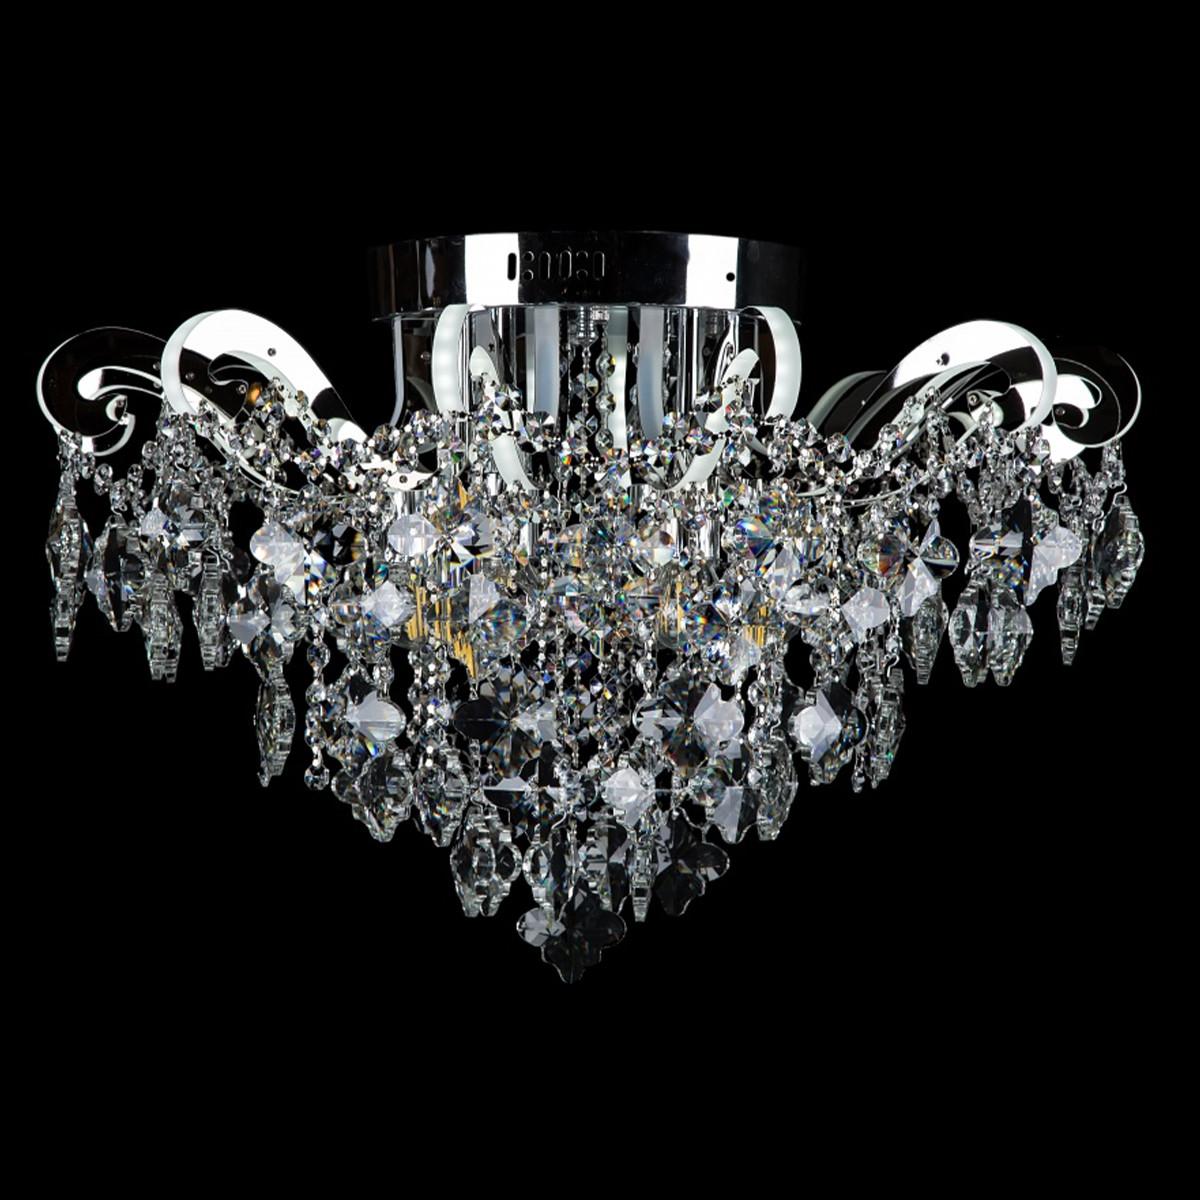 Хрустальная люстра СветМира на 6 лампочек со встроенной LED подсветкой рожков VL-2878/6+12 LED